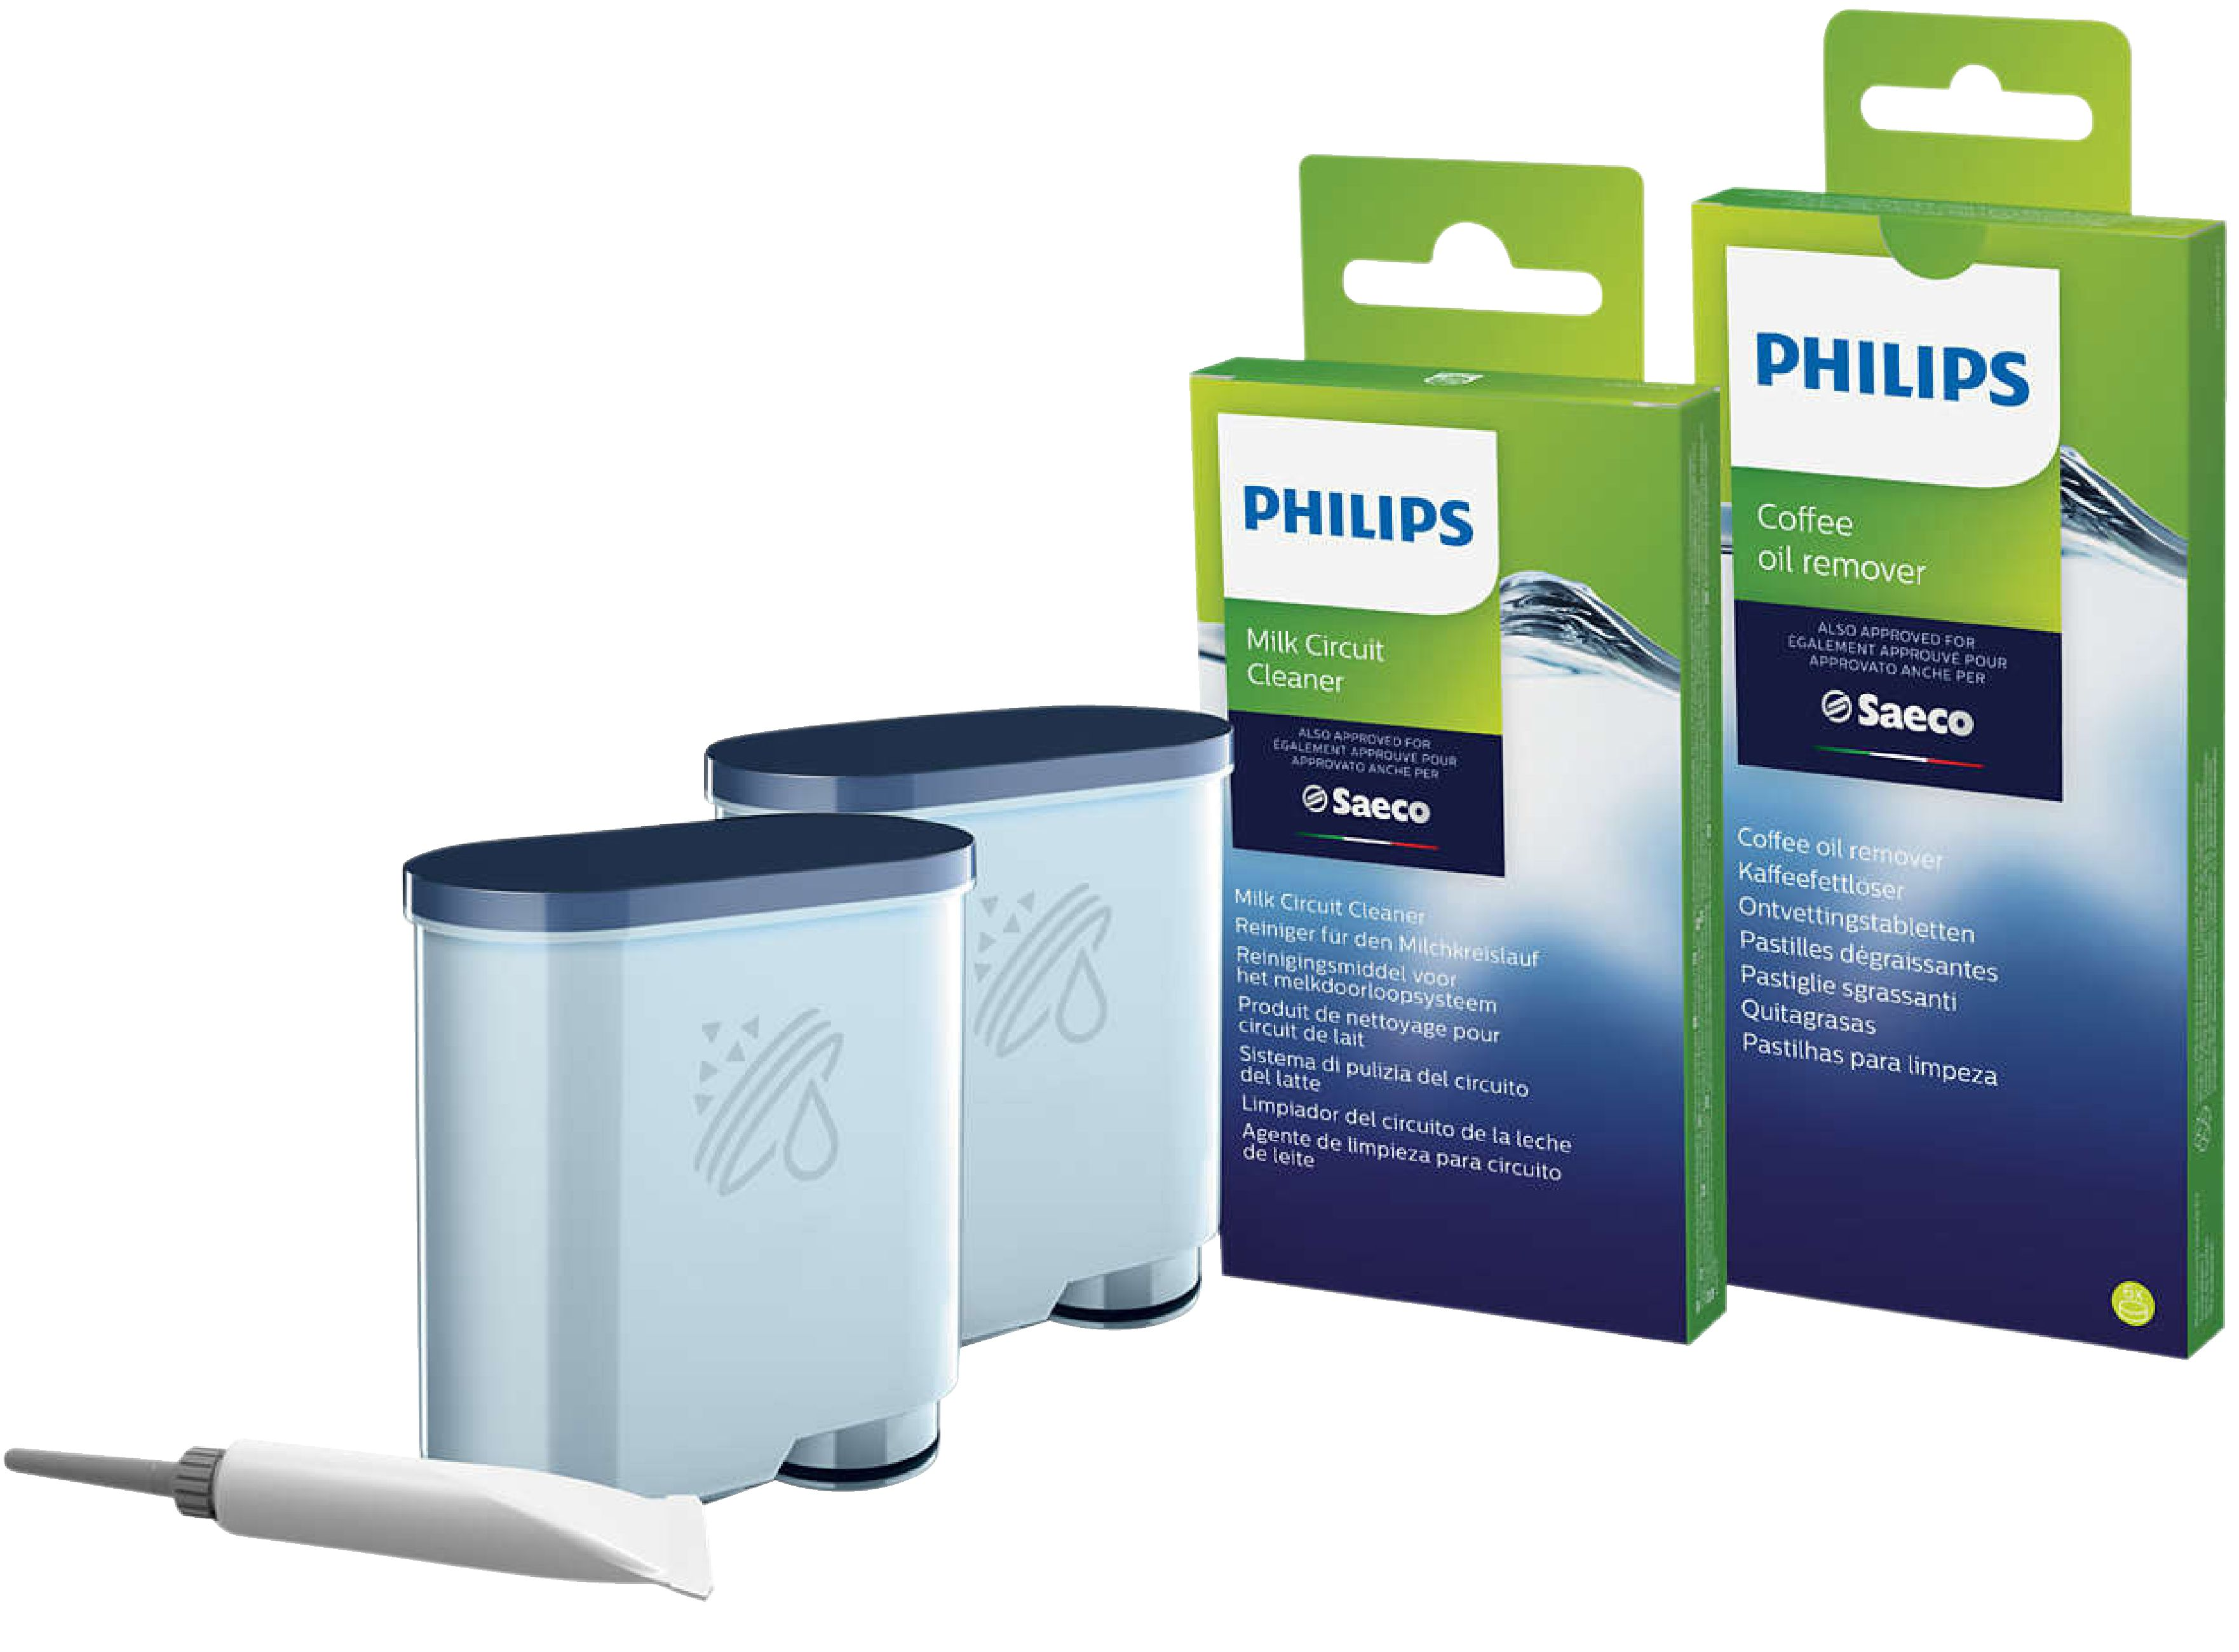 Sada pro údržbu kávovaru Philips CA6707/10